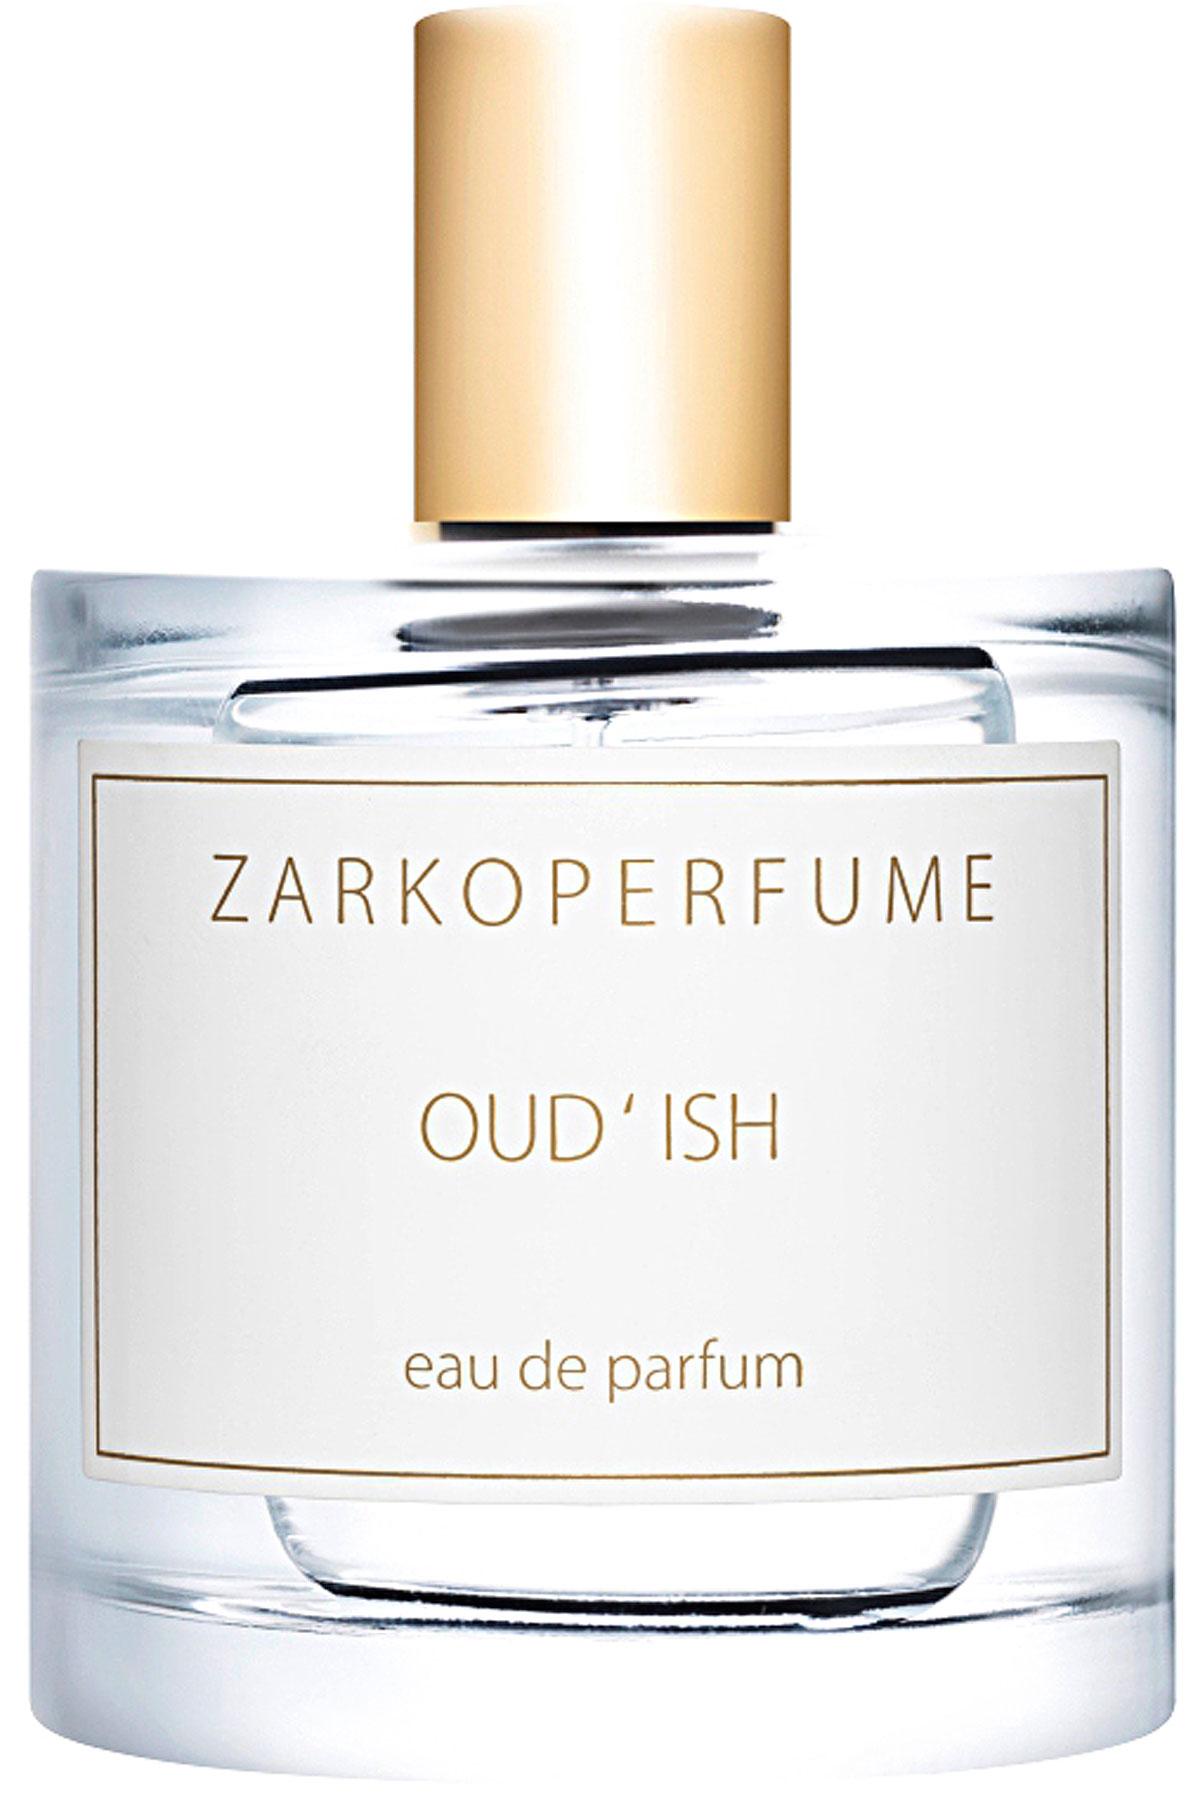 Zarkoperfume Fragrances for Women, Oud Ish - Eau De Parfum - 100 Ml, 2019, 100 ml